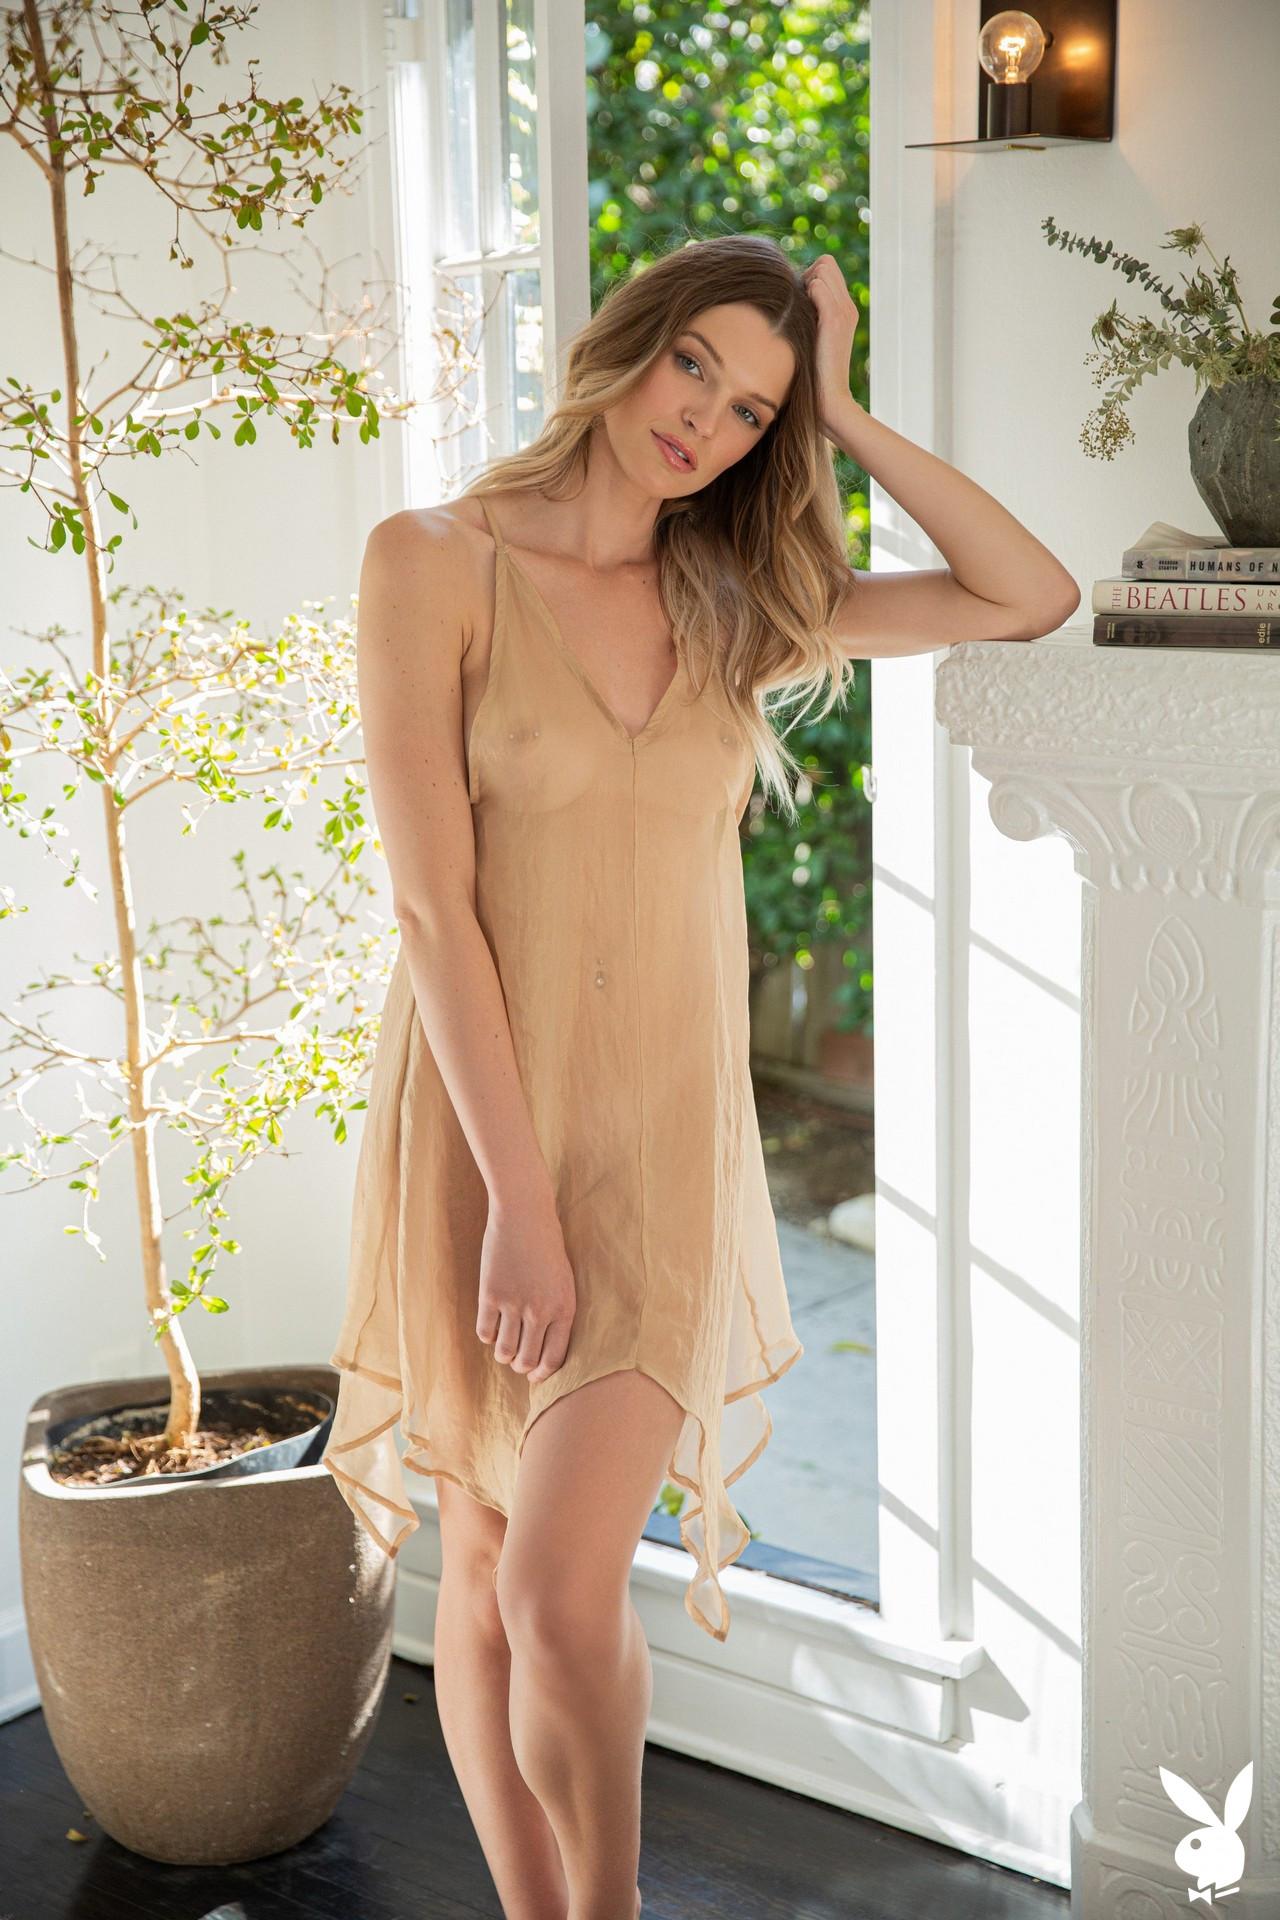 Brooke Lorraine In Simple Moments Playboy Plus (1)